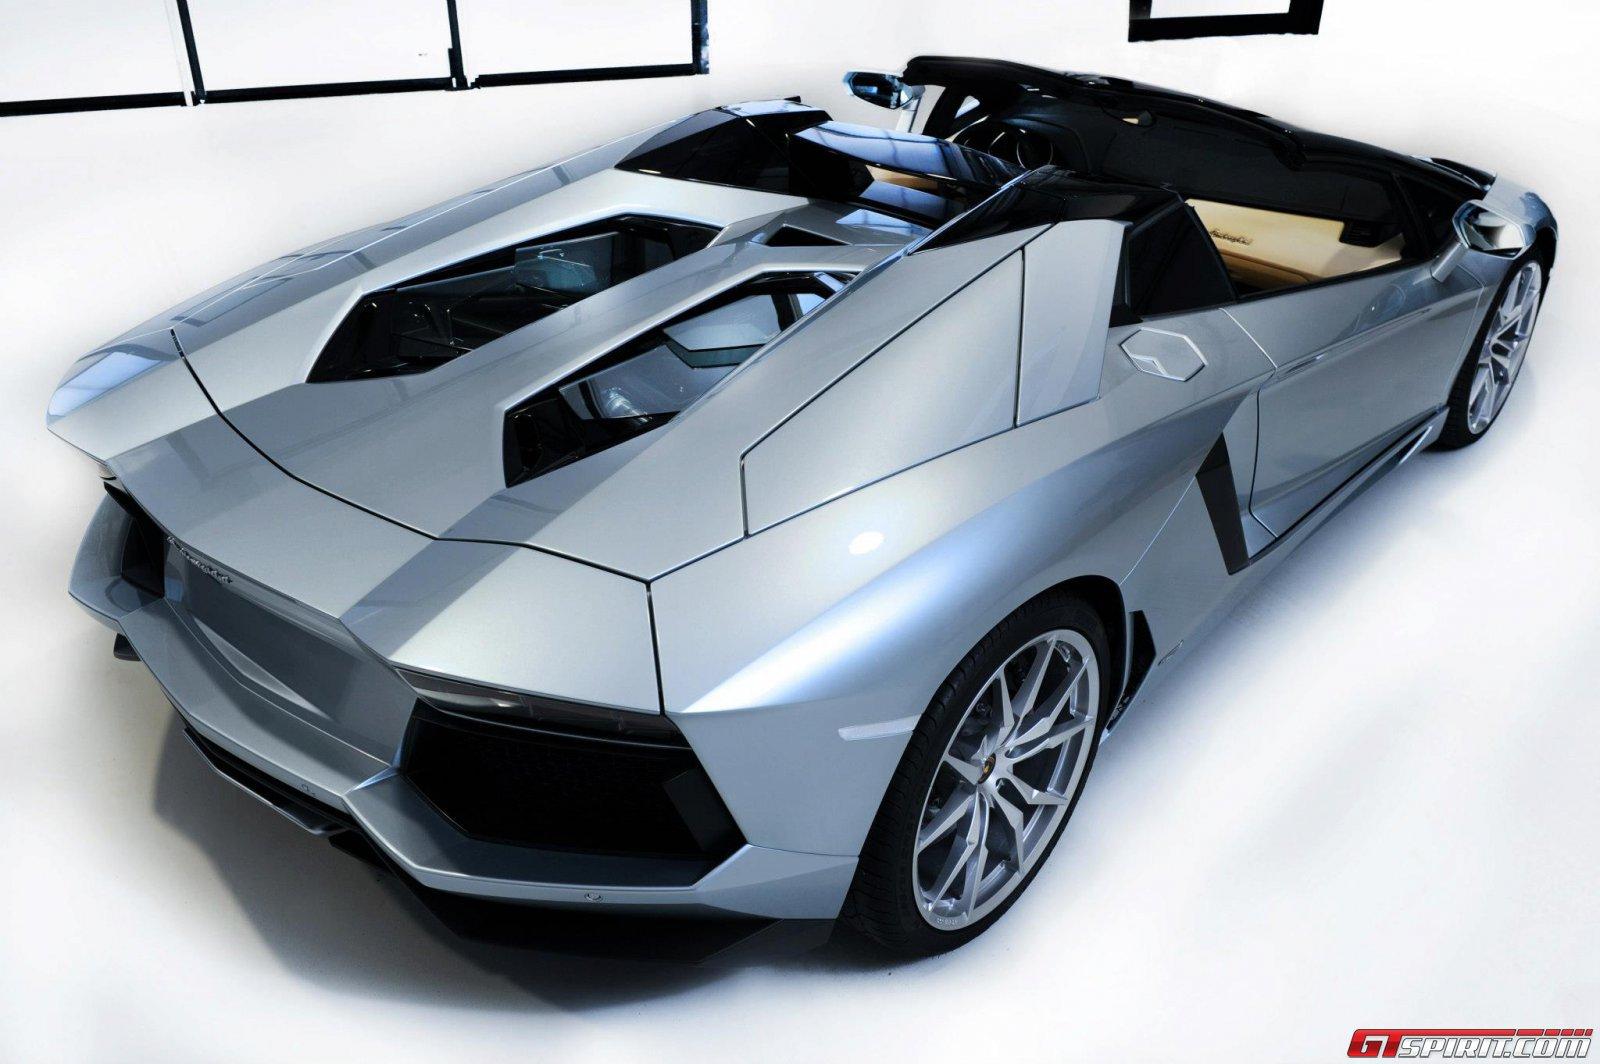 2013 Lamborghini Aventador LP700-4 Roadster Photo 24